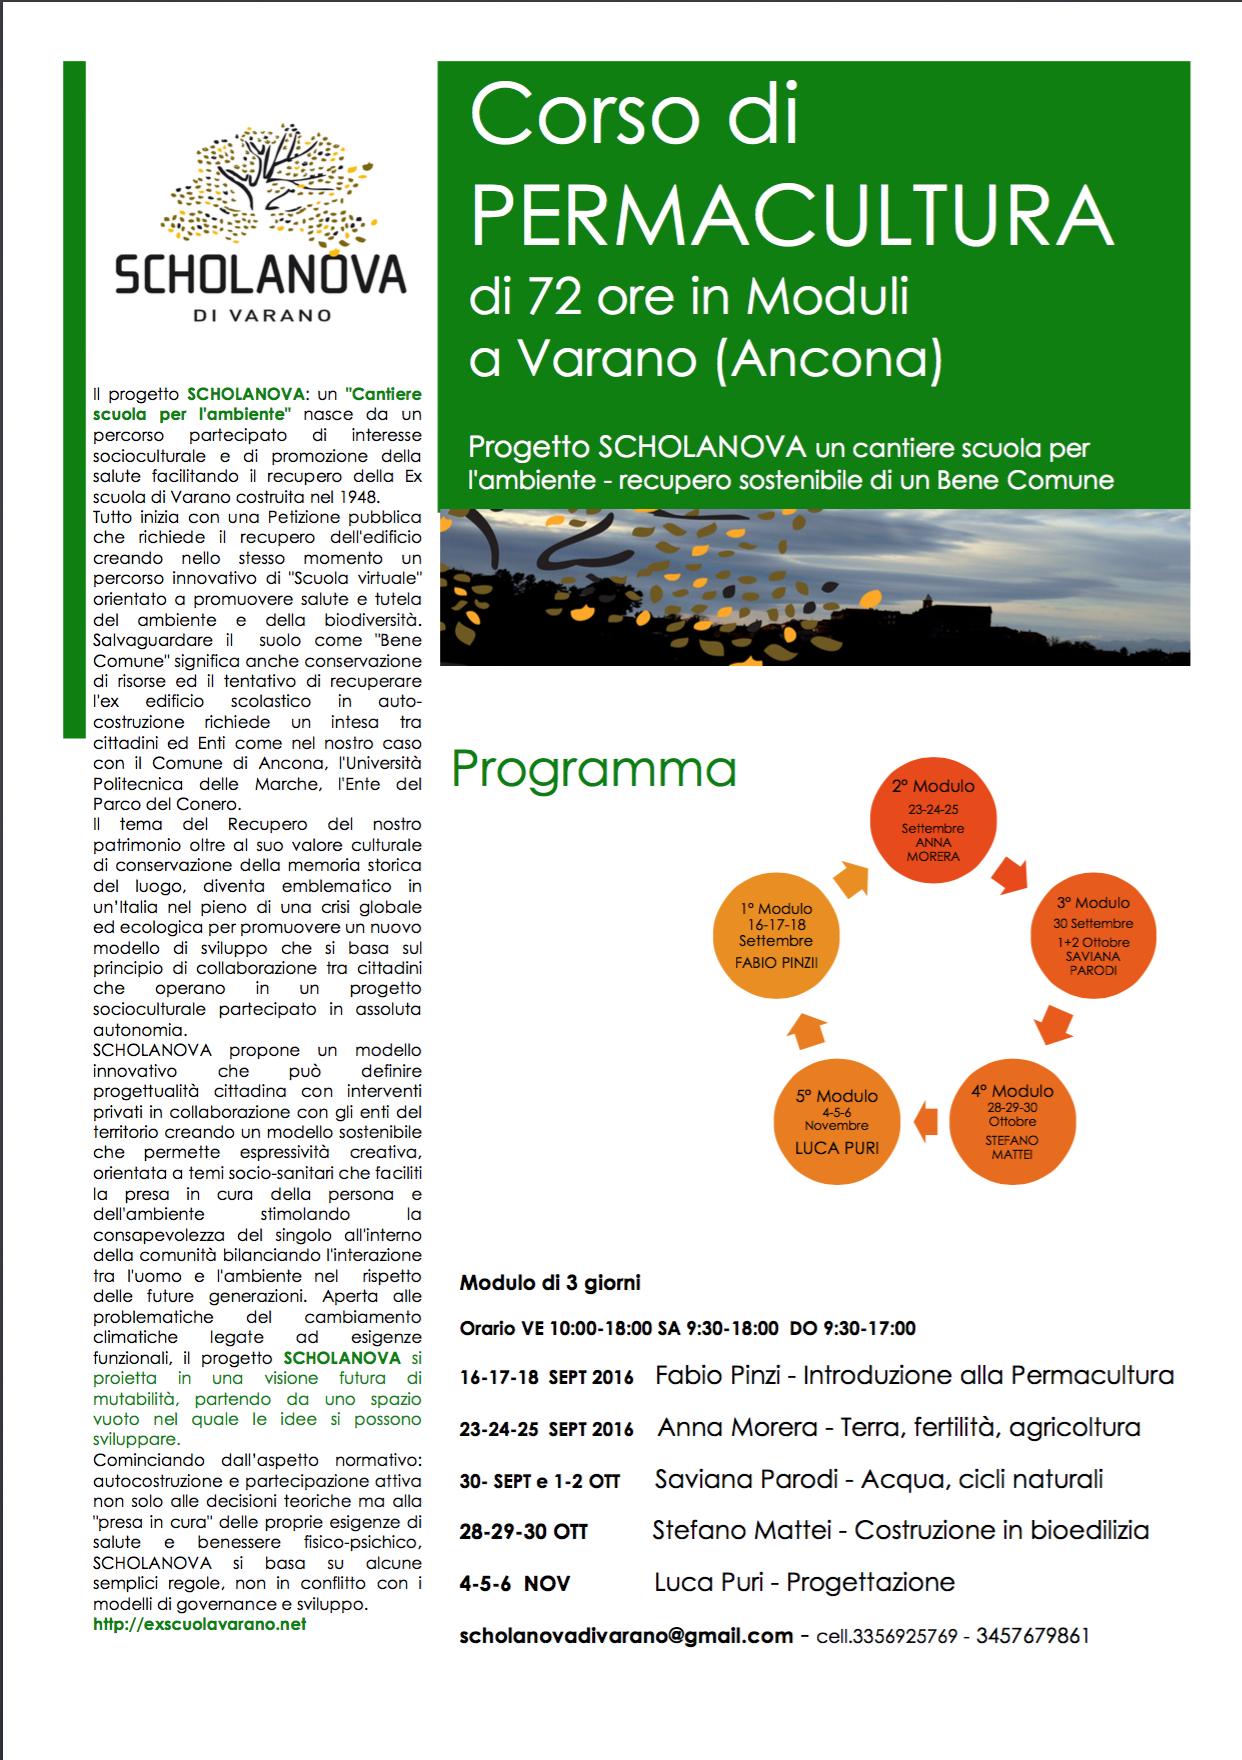 programmaperma20septbis (1).jpg